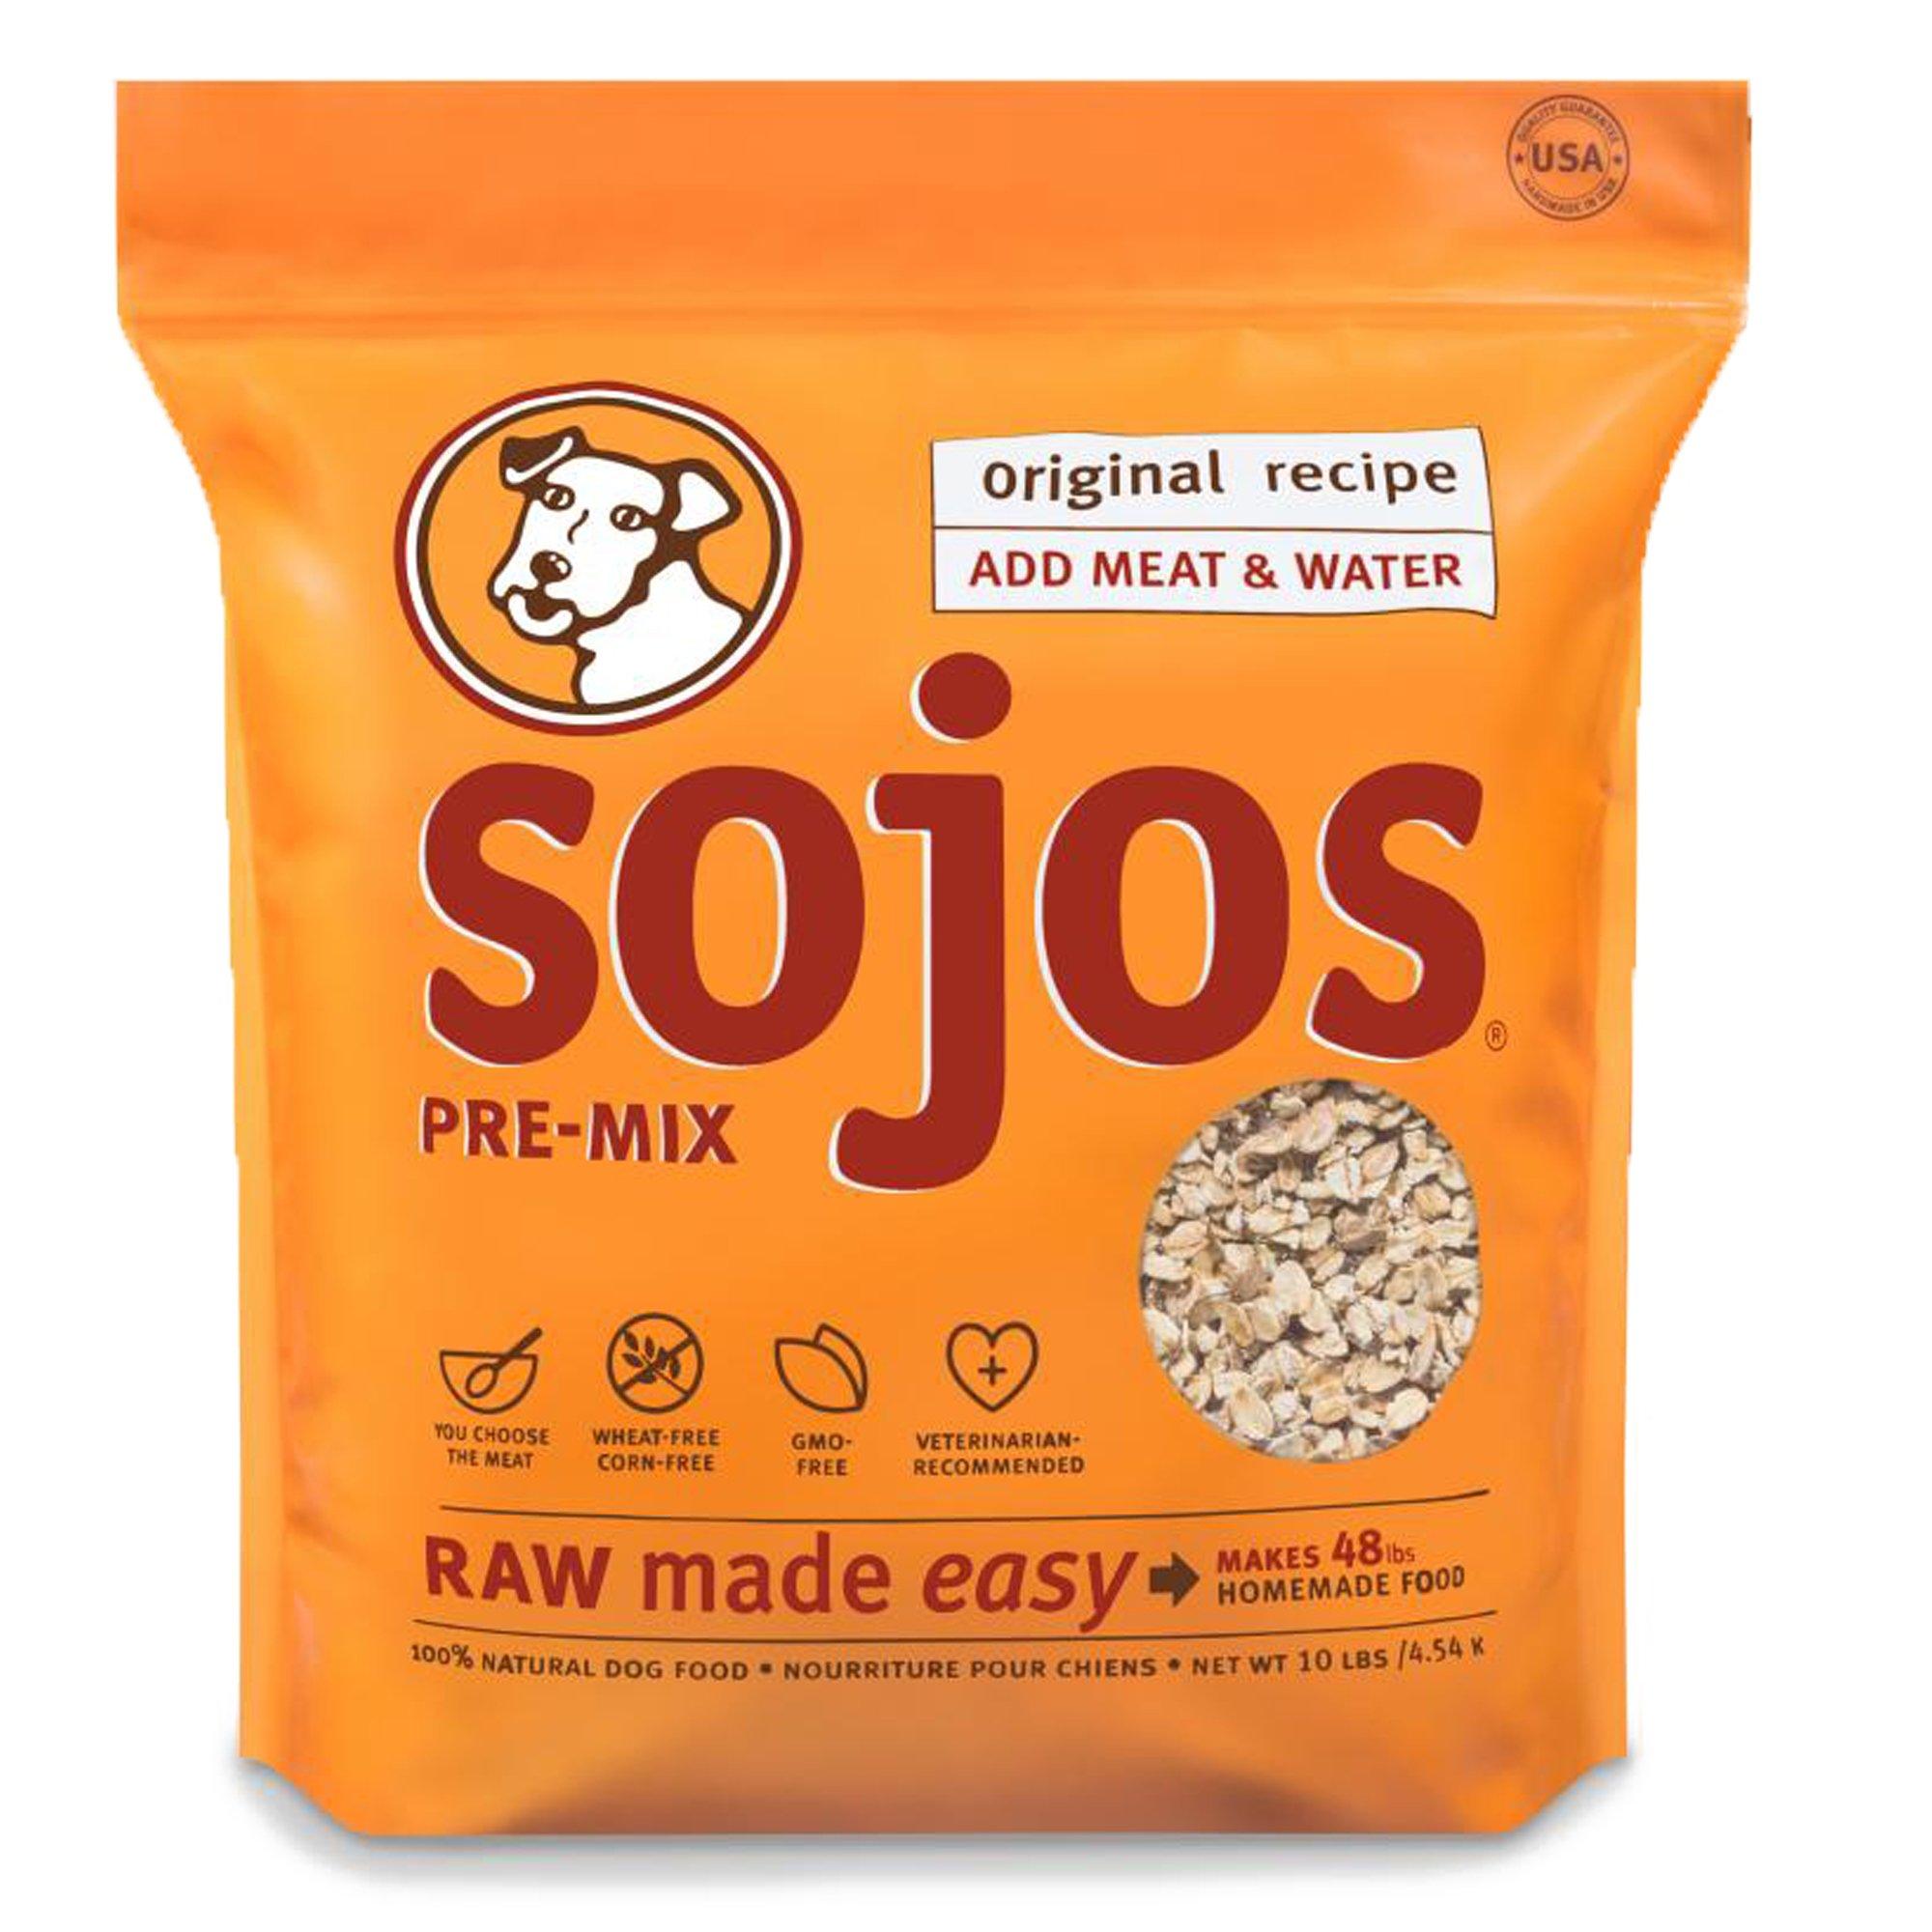 Original Dry Dog Food Mix Size: 10-lb bag by SOJOS